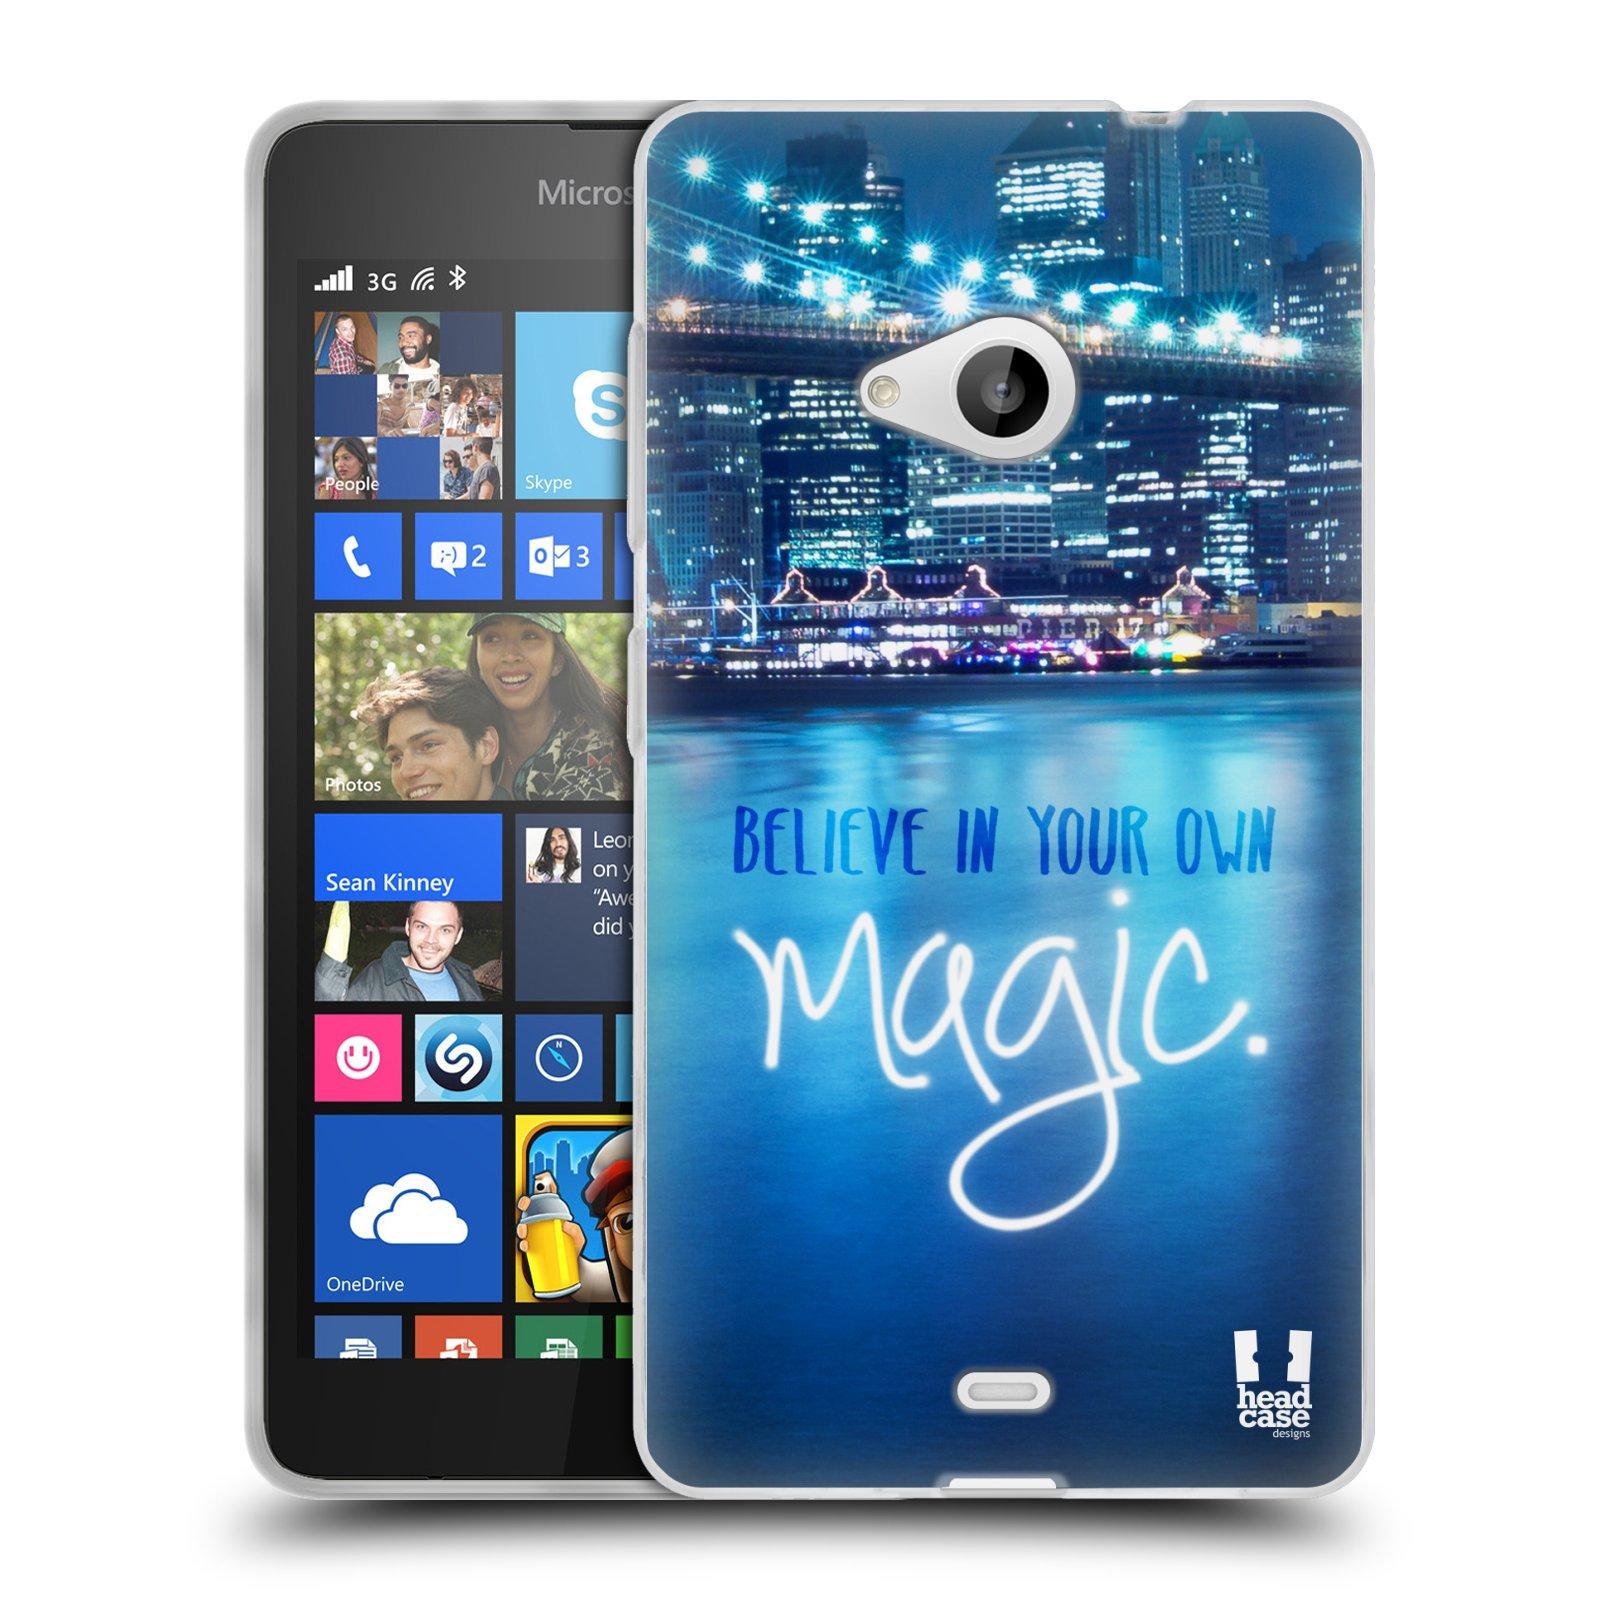 Silikonové pouzdro na mobil Microsoft Lumia 535 HEAD CASE MAGICAL (Silikonový kryt či obal na mobilní telefon Microsoft Lumia 535)